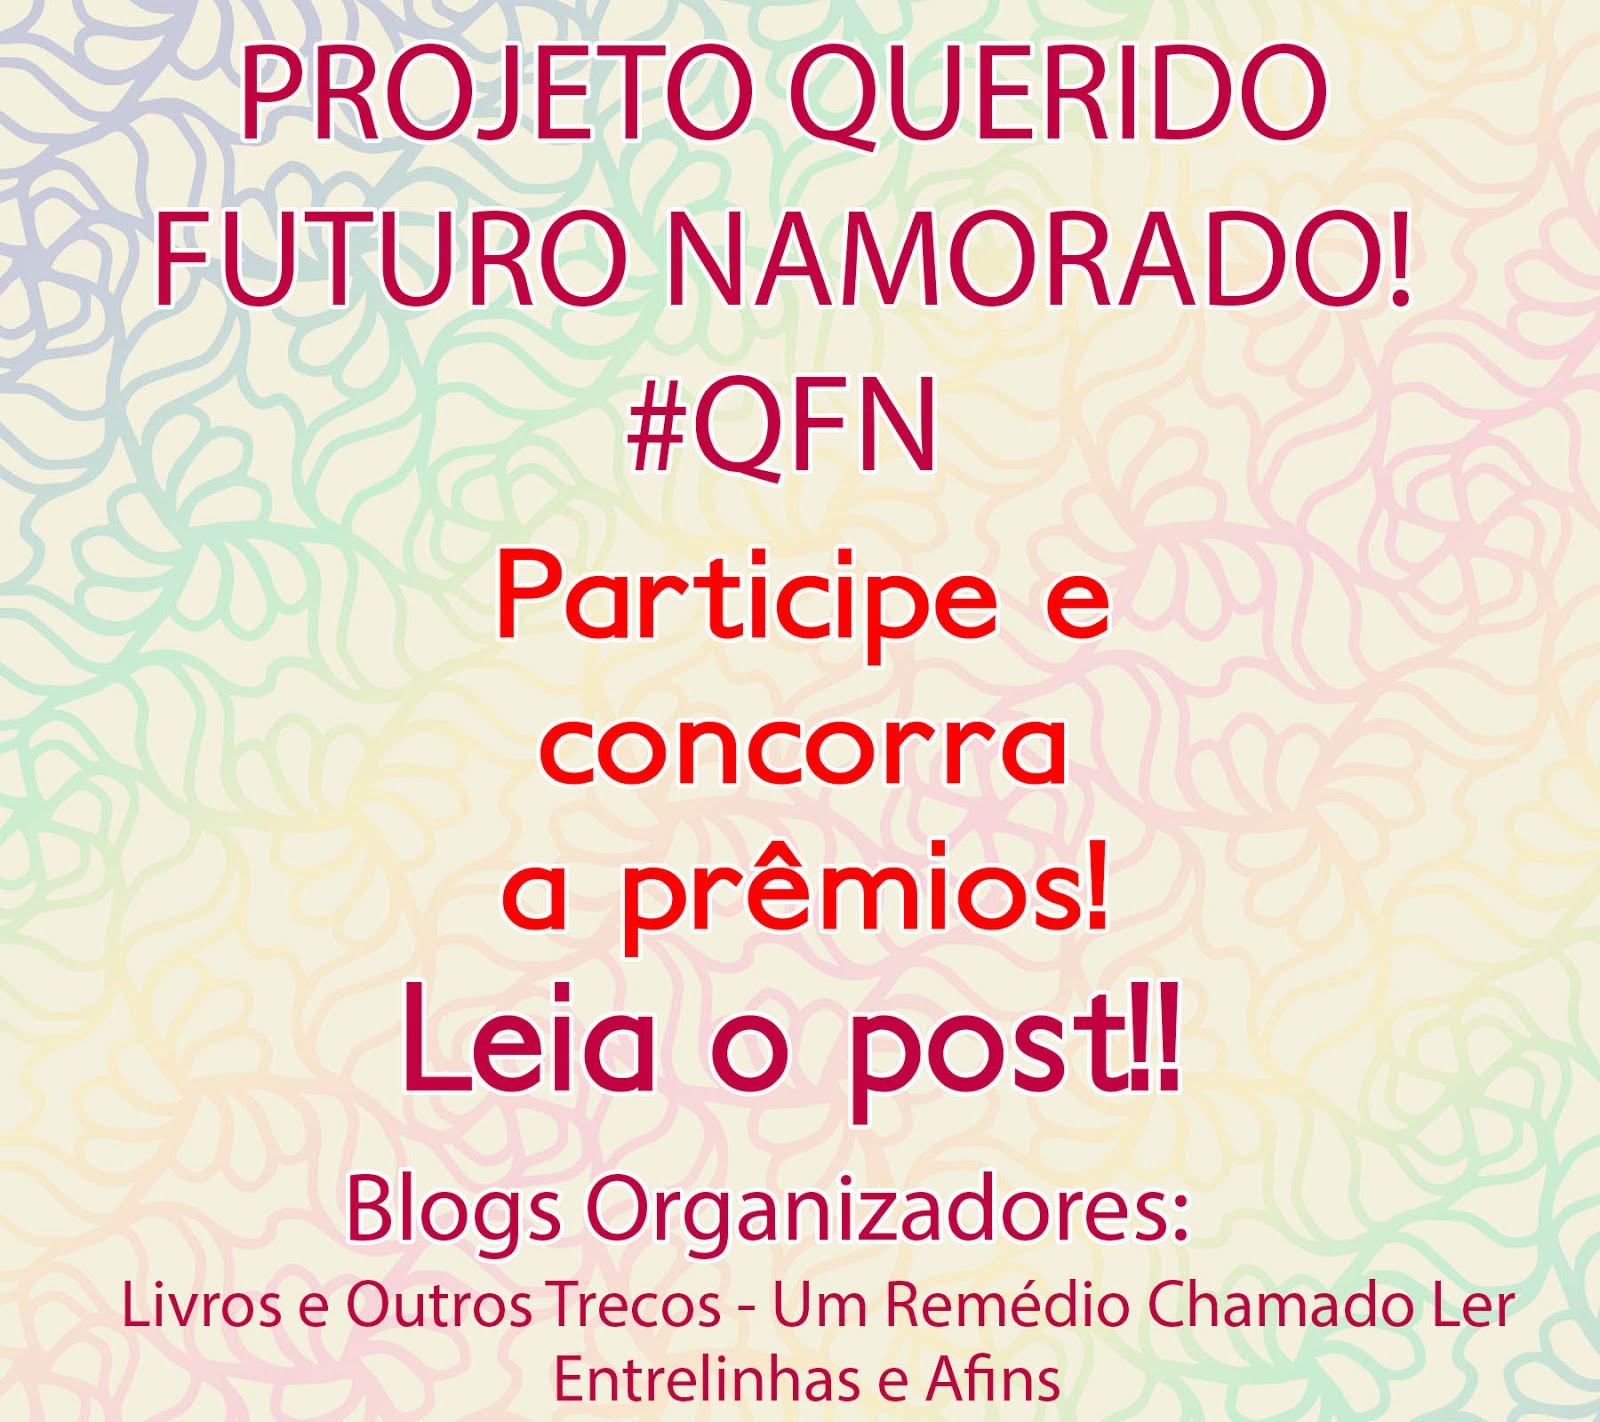 #projetoQFN